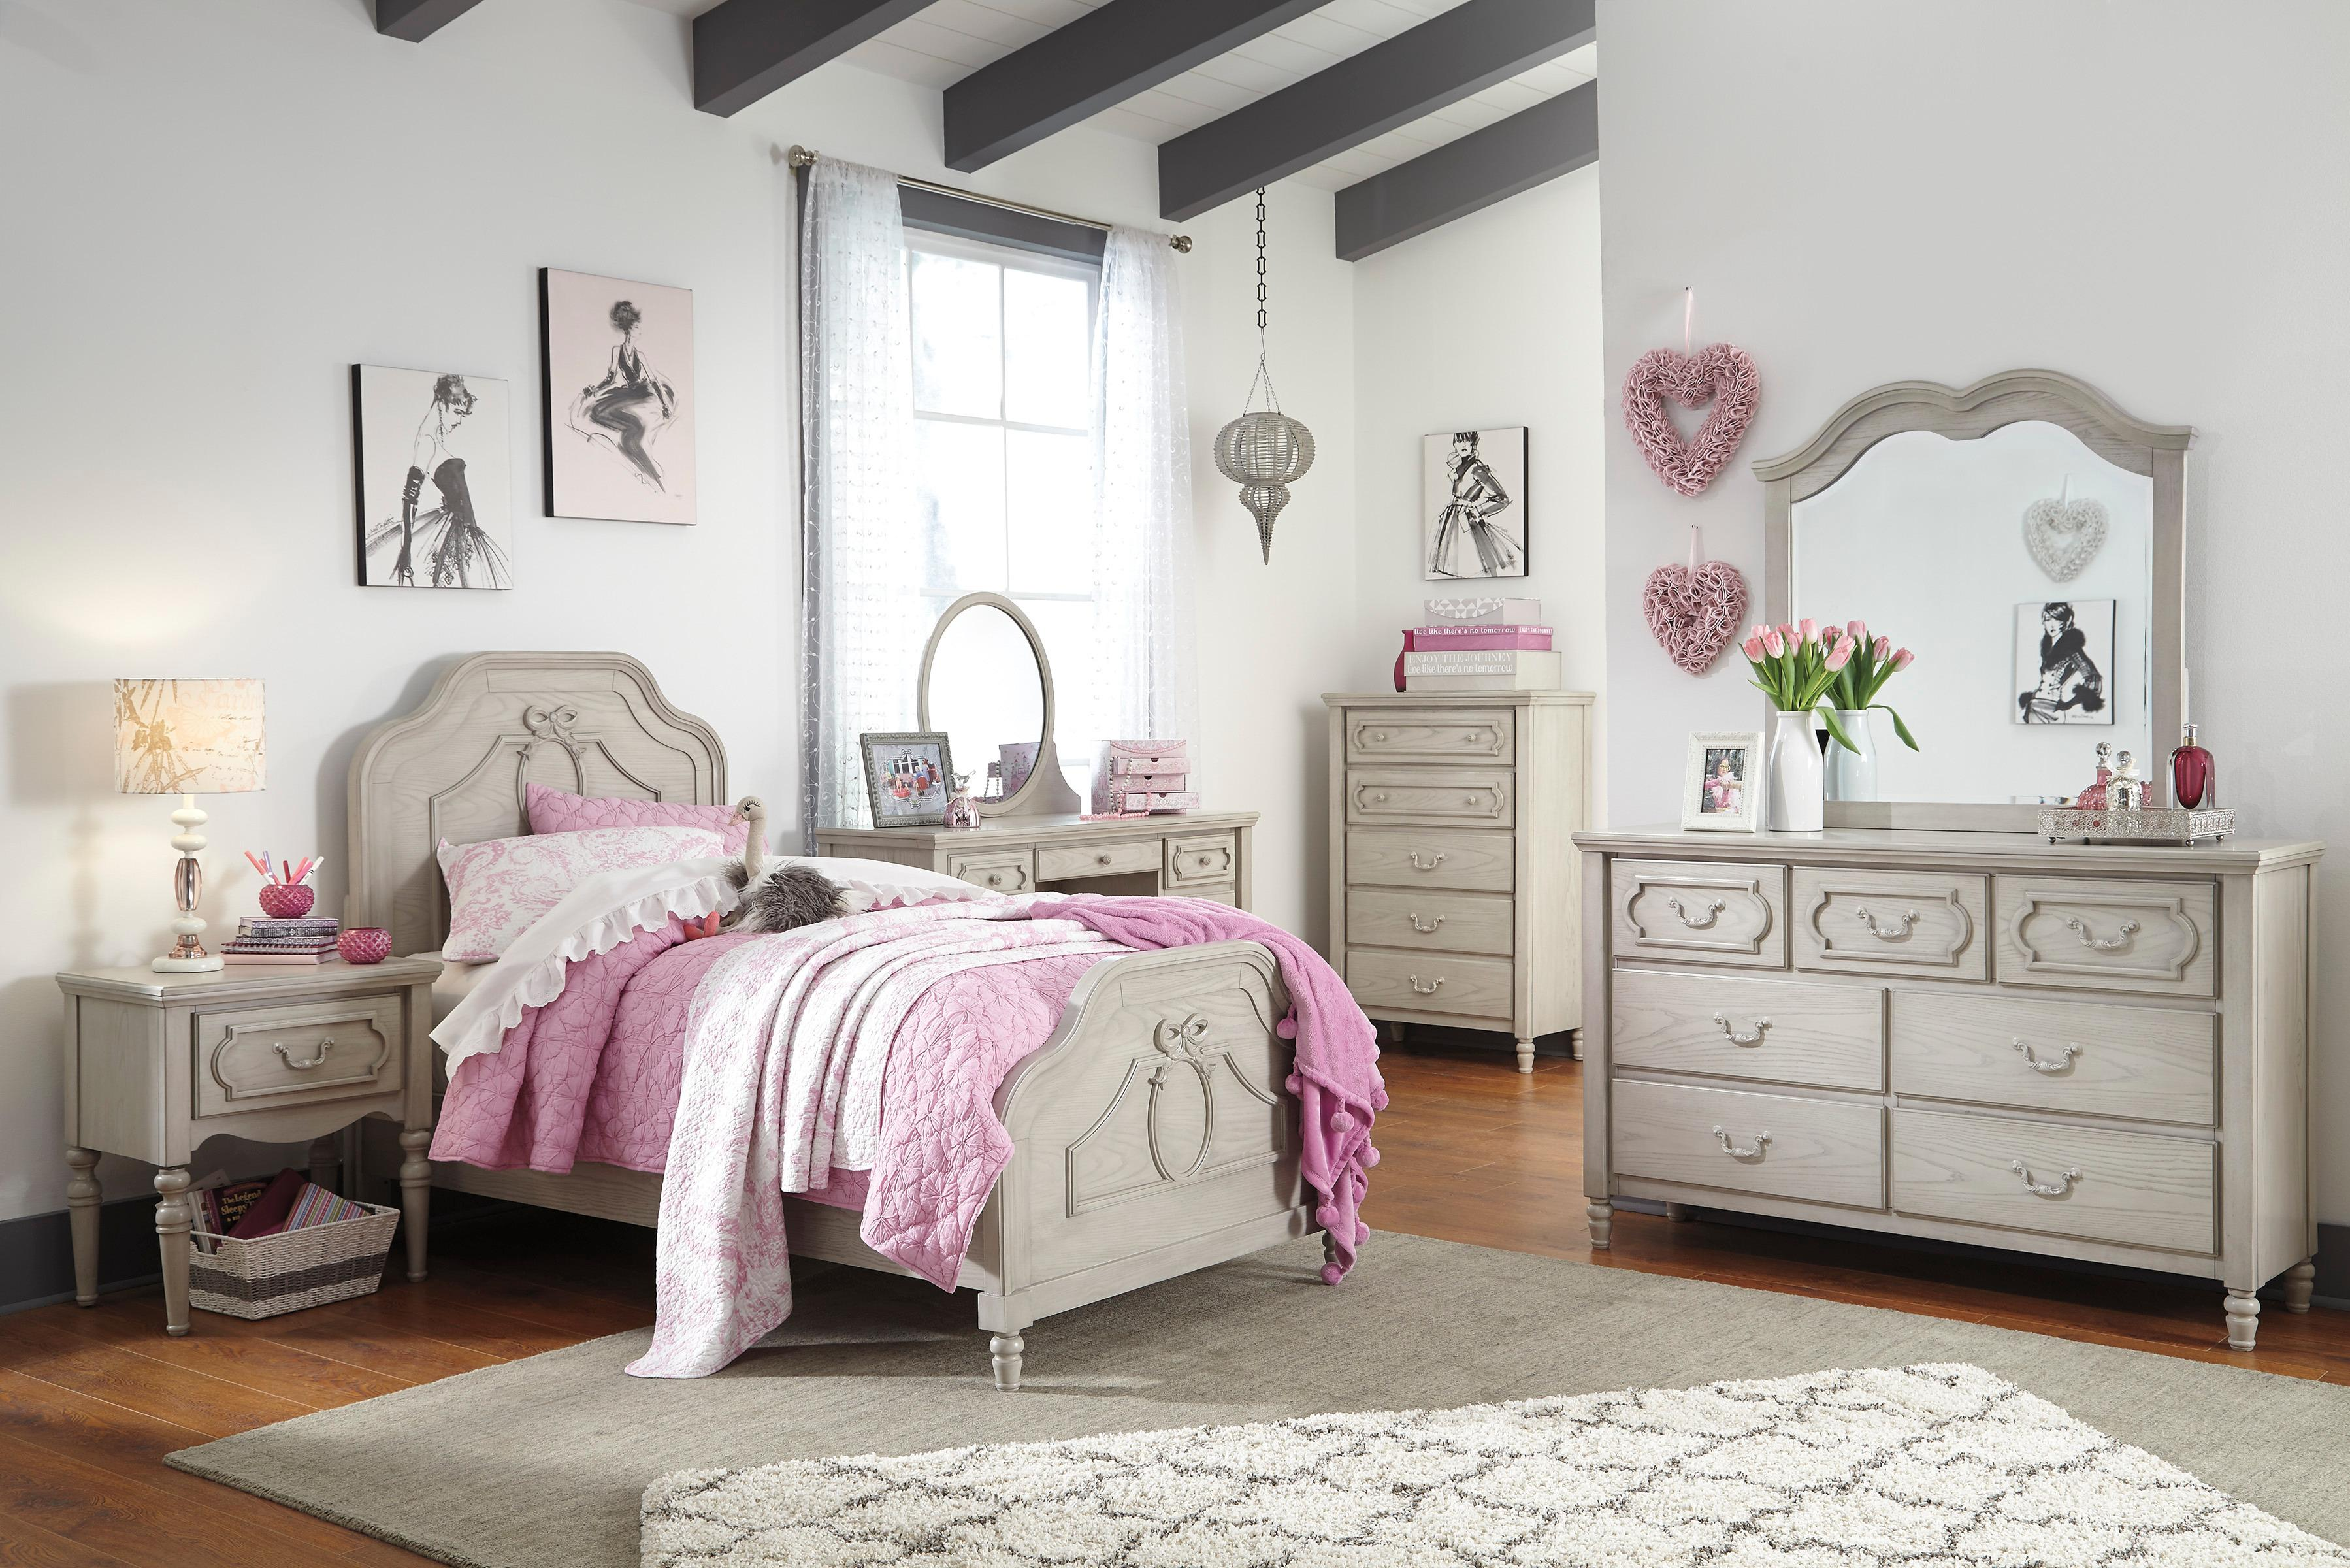 Ashley HomeStore image 6